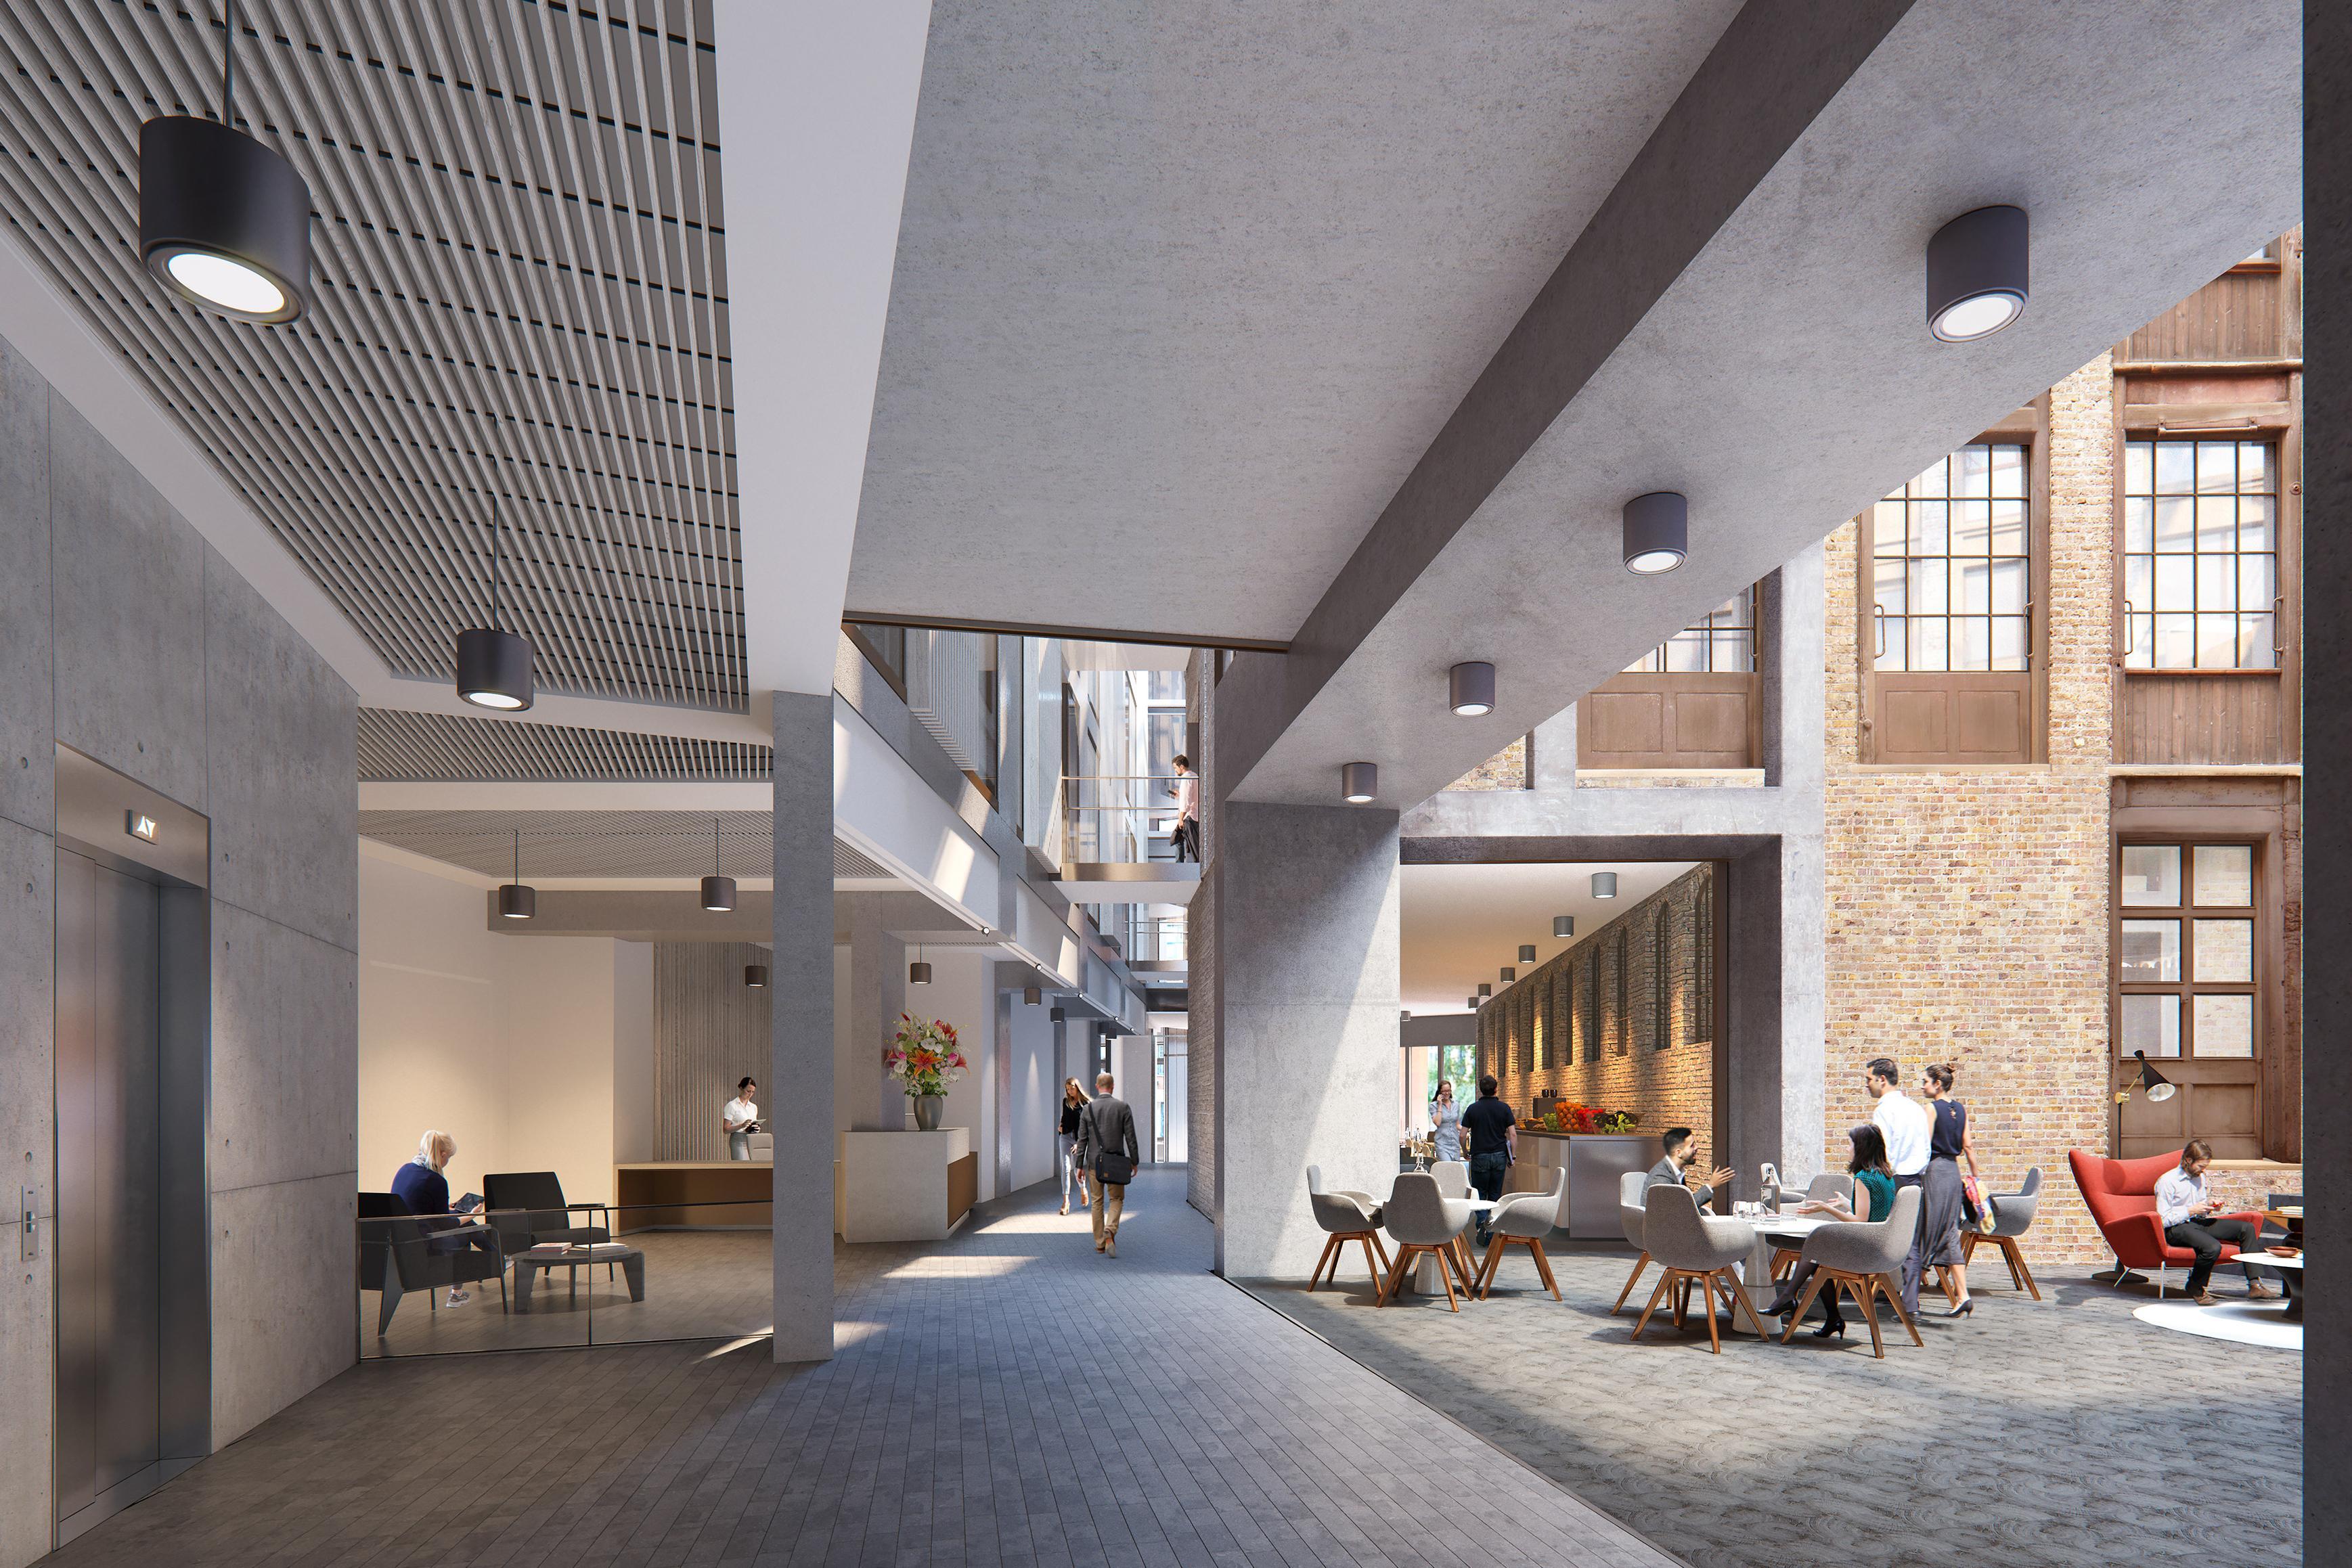 Office London, EC1M 4AZ - Farmiloe Building